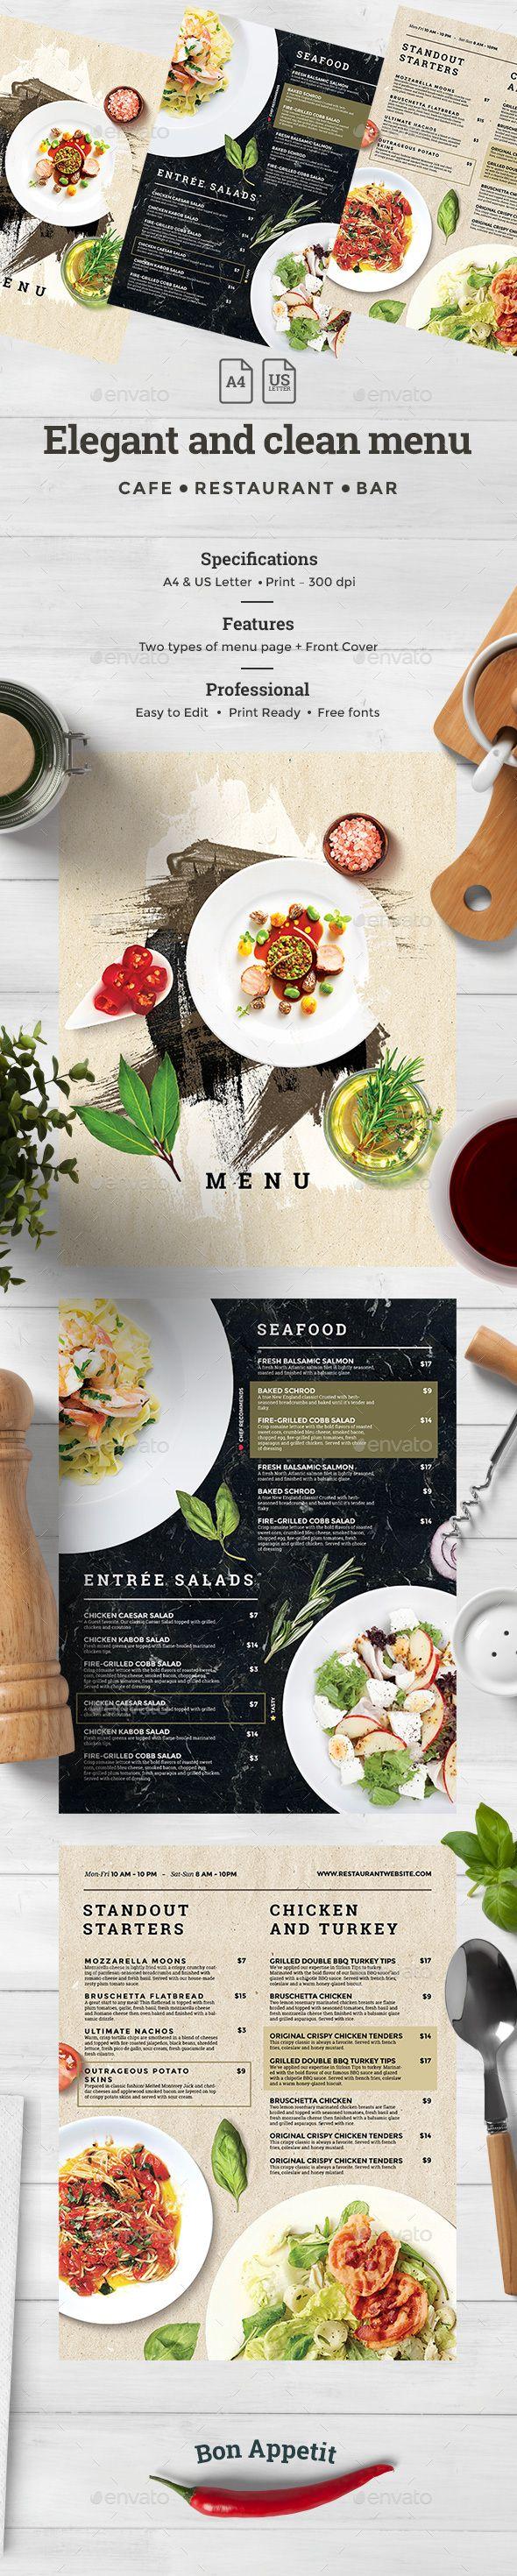 Food Menu Template PSD. Download here: https://graphicriver.net/item/food-menu/17647808?ref=ksioks